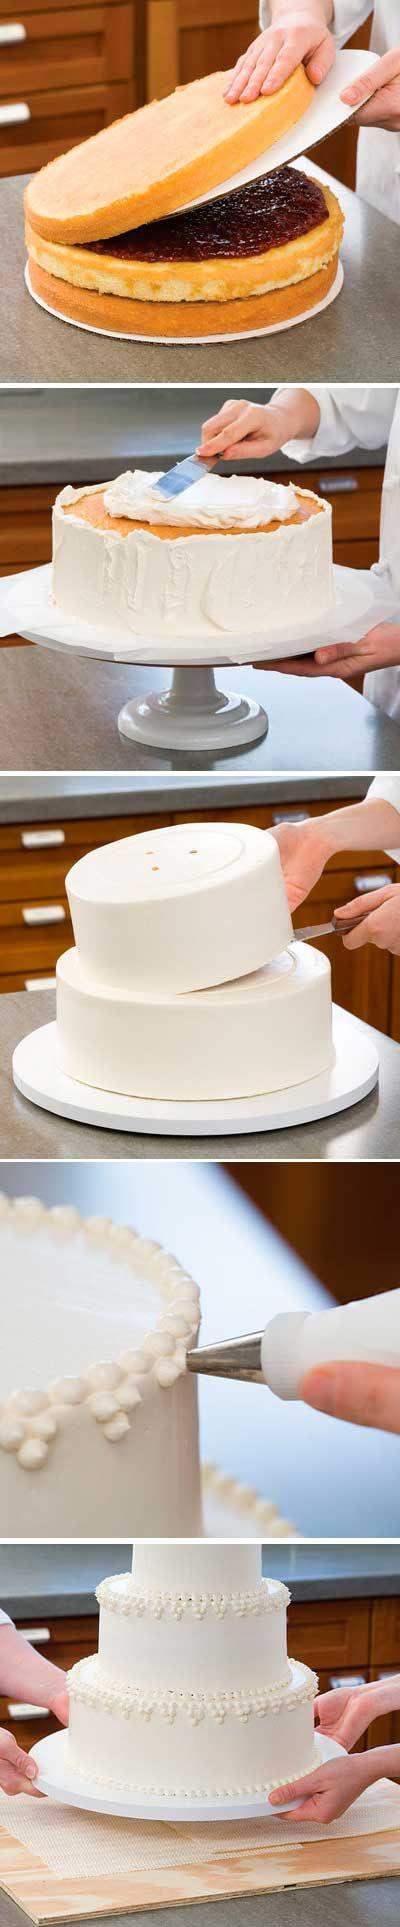 Secrets to making a wedding cake.